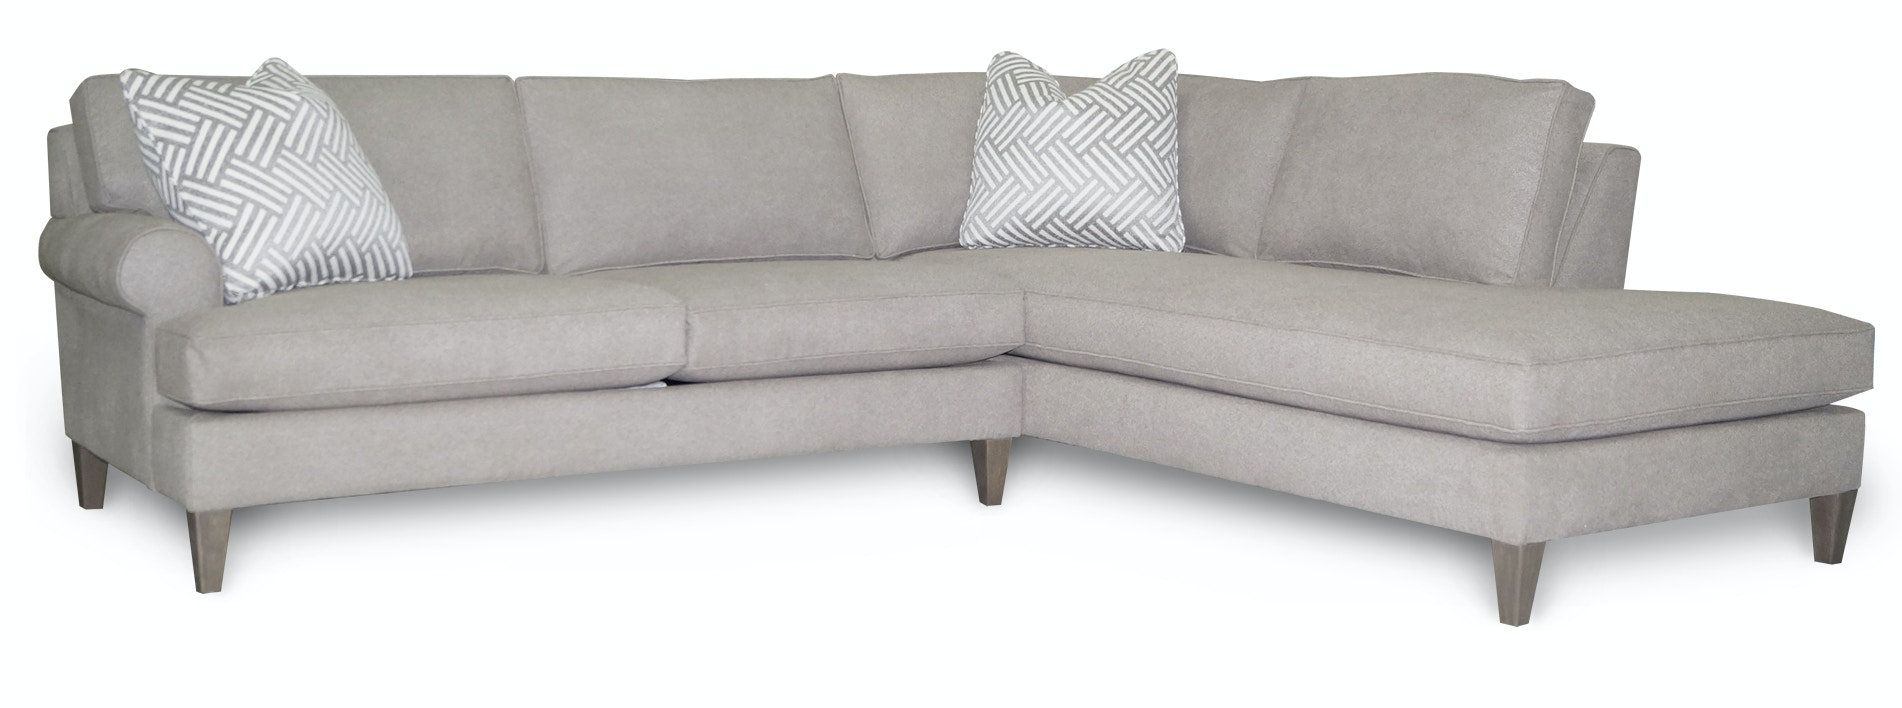 Stanford 2 Piece Sofa Chaise (RAF) KT:88971